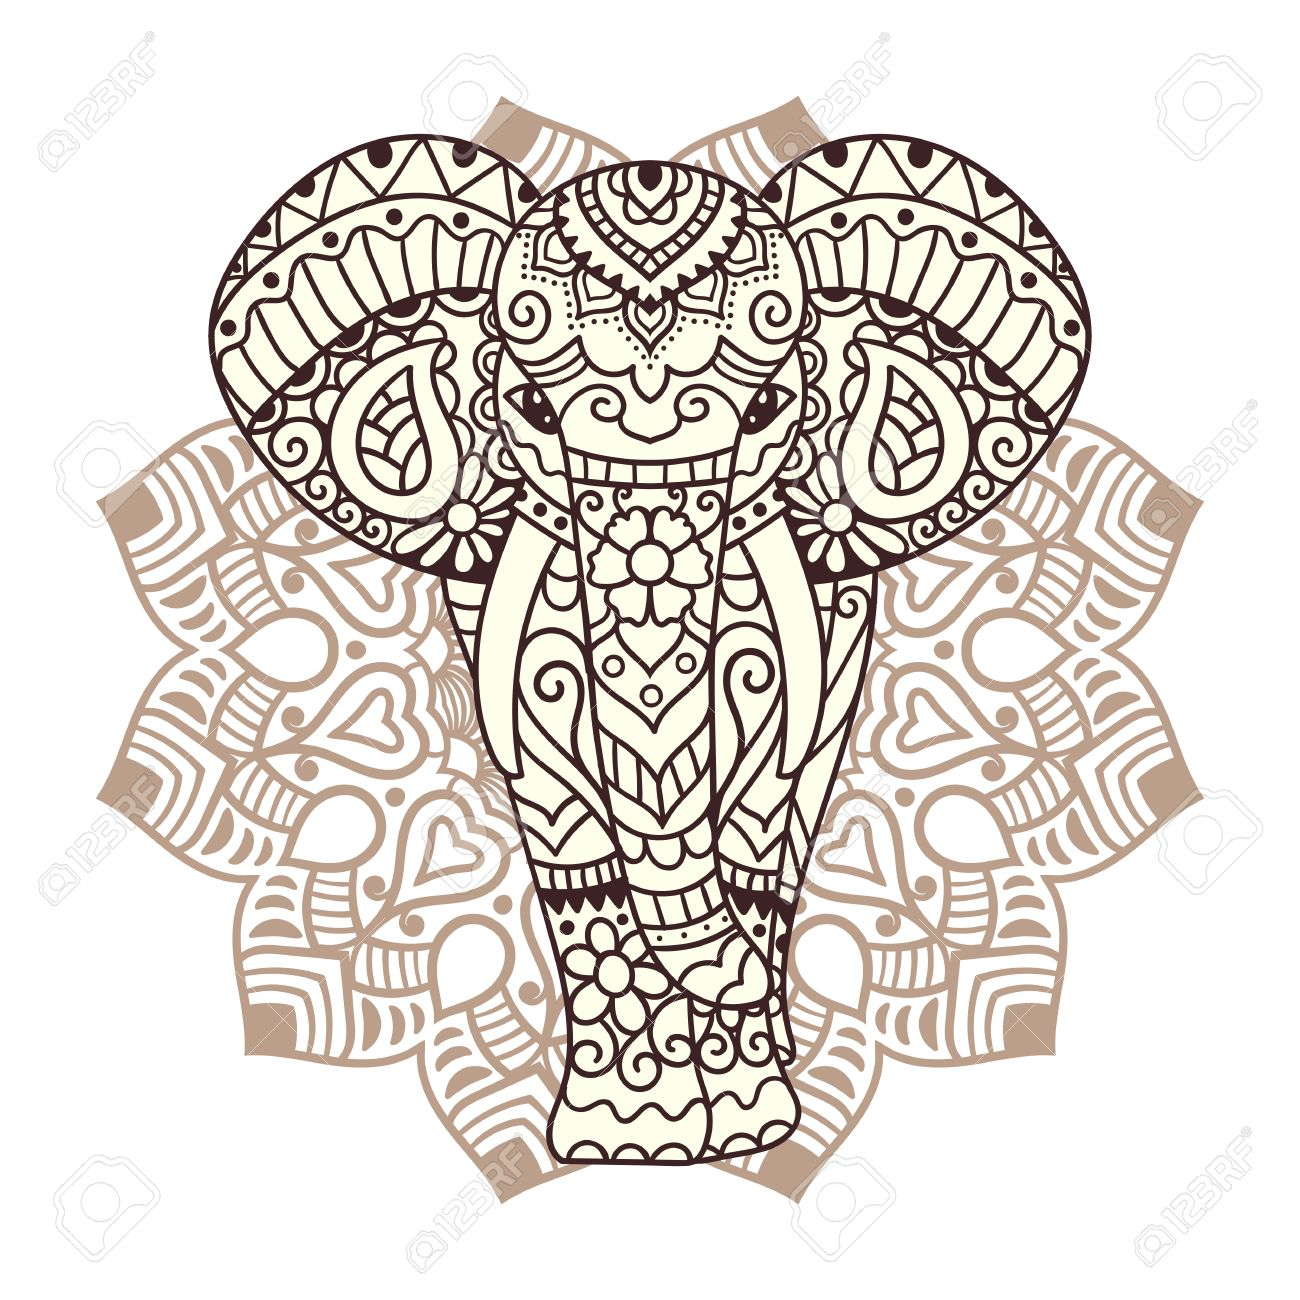 decorative elephant with mandala indian theme with ornaments